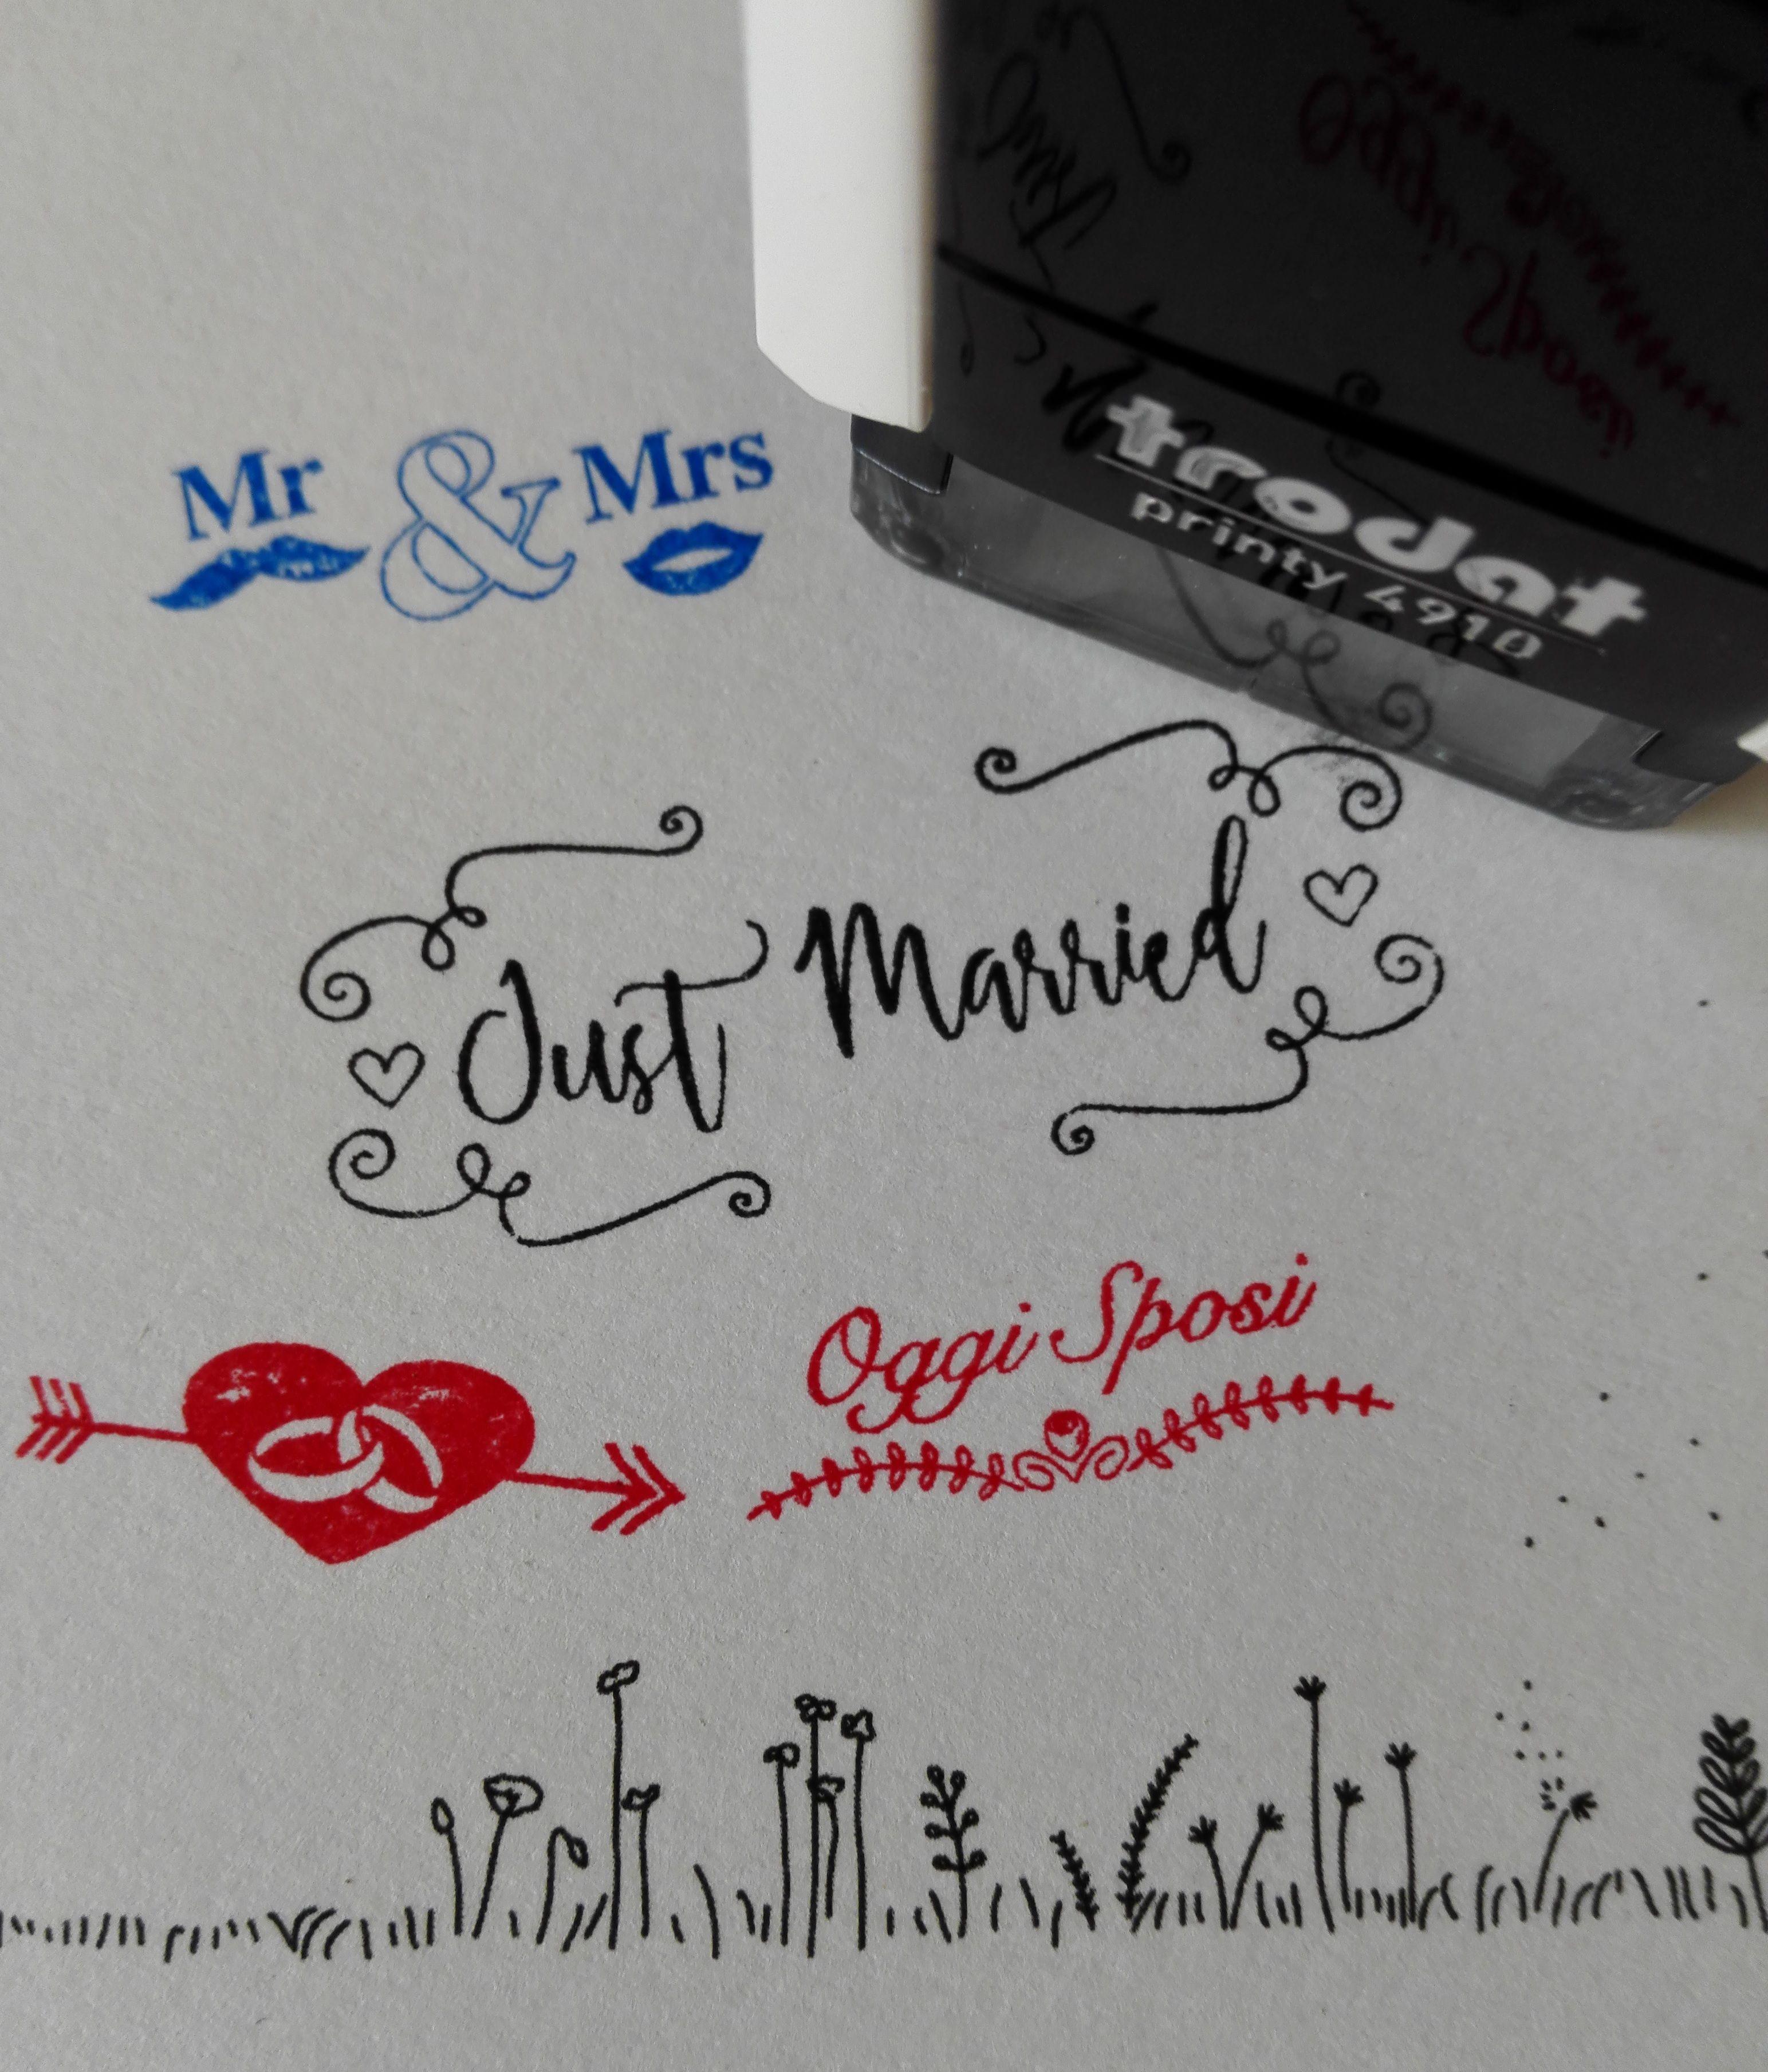 ca712f4871a3 Timbri personalizzati matrimoni Oggi sposi - Just married - Mr Mrs  fede   nuziale  nozze